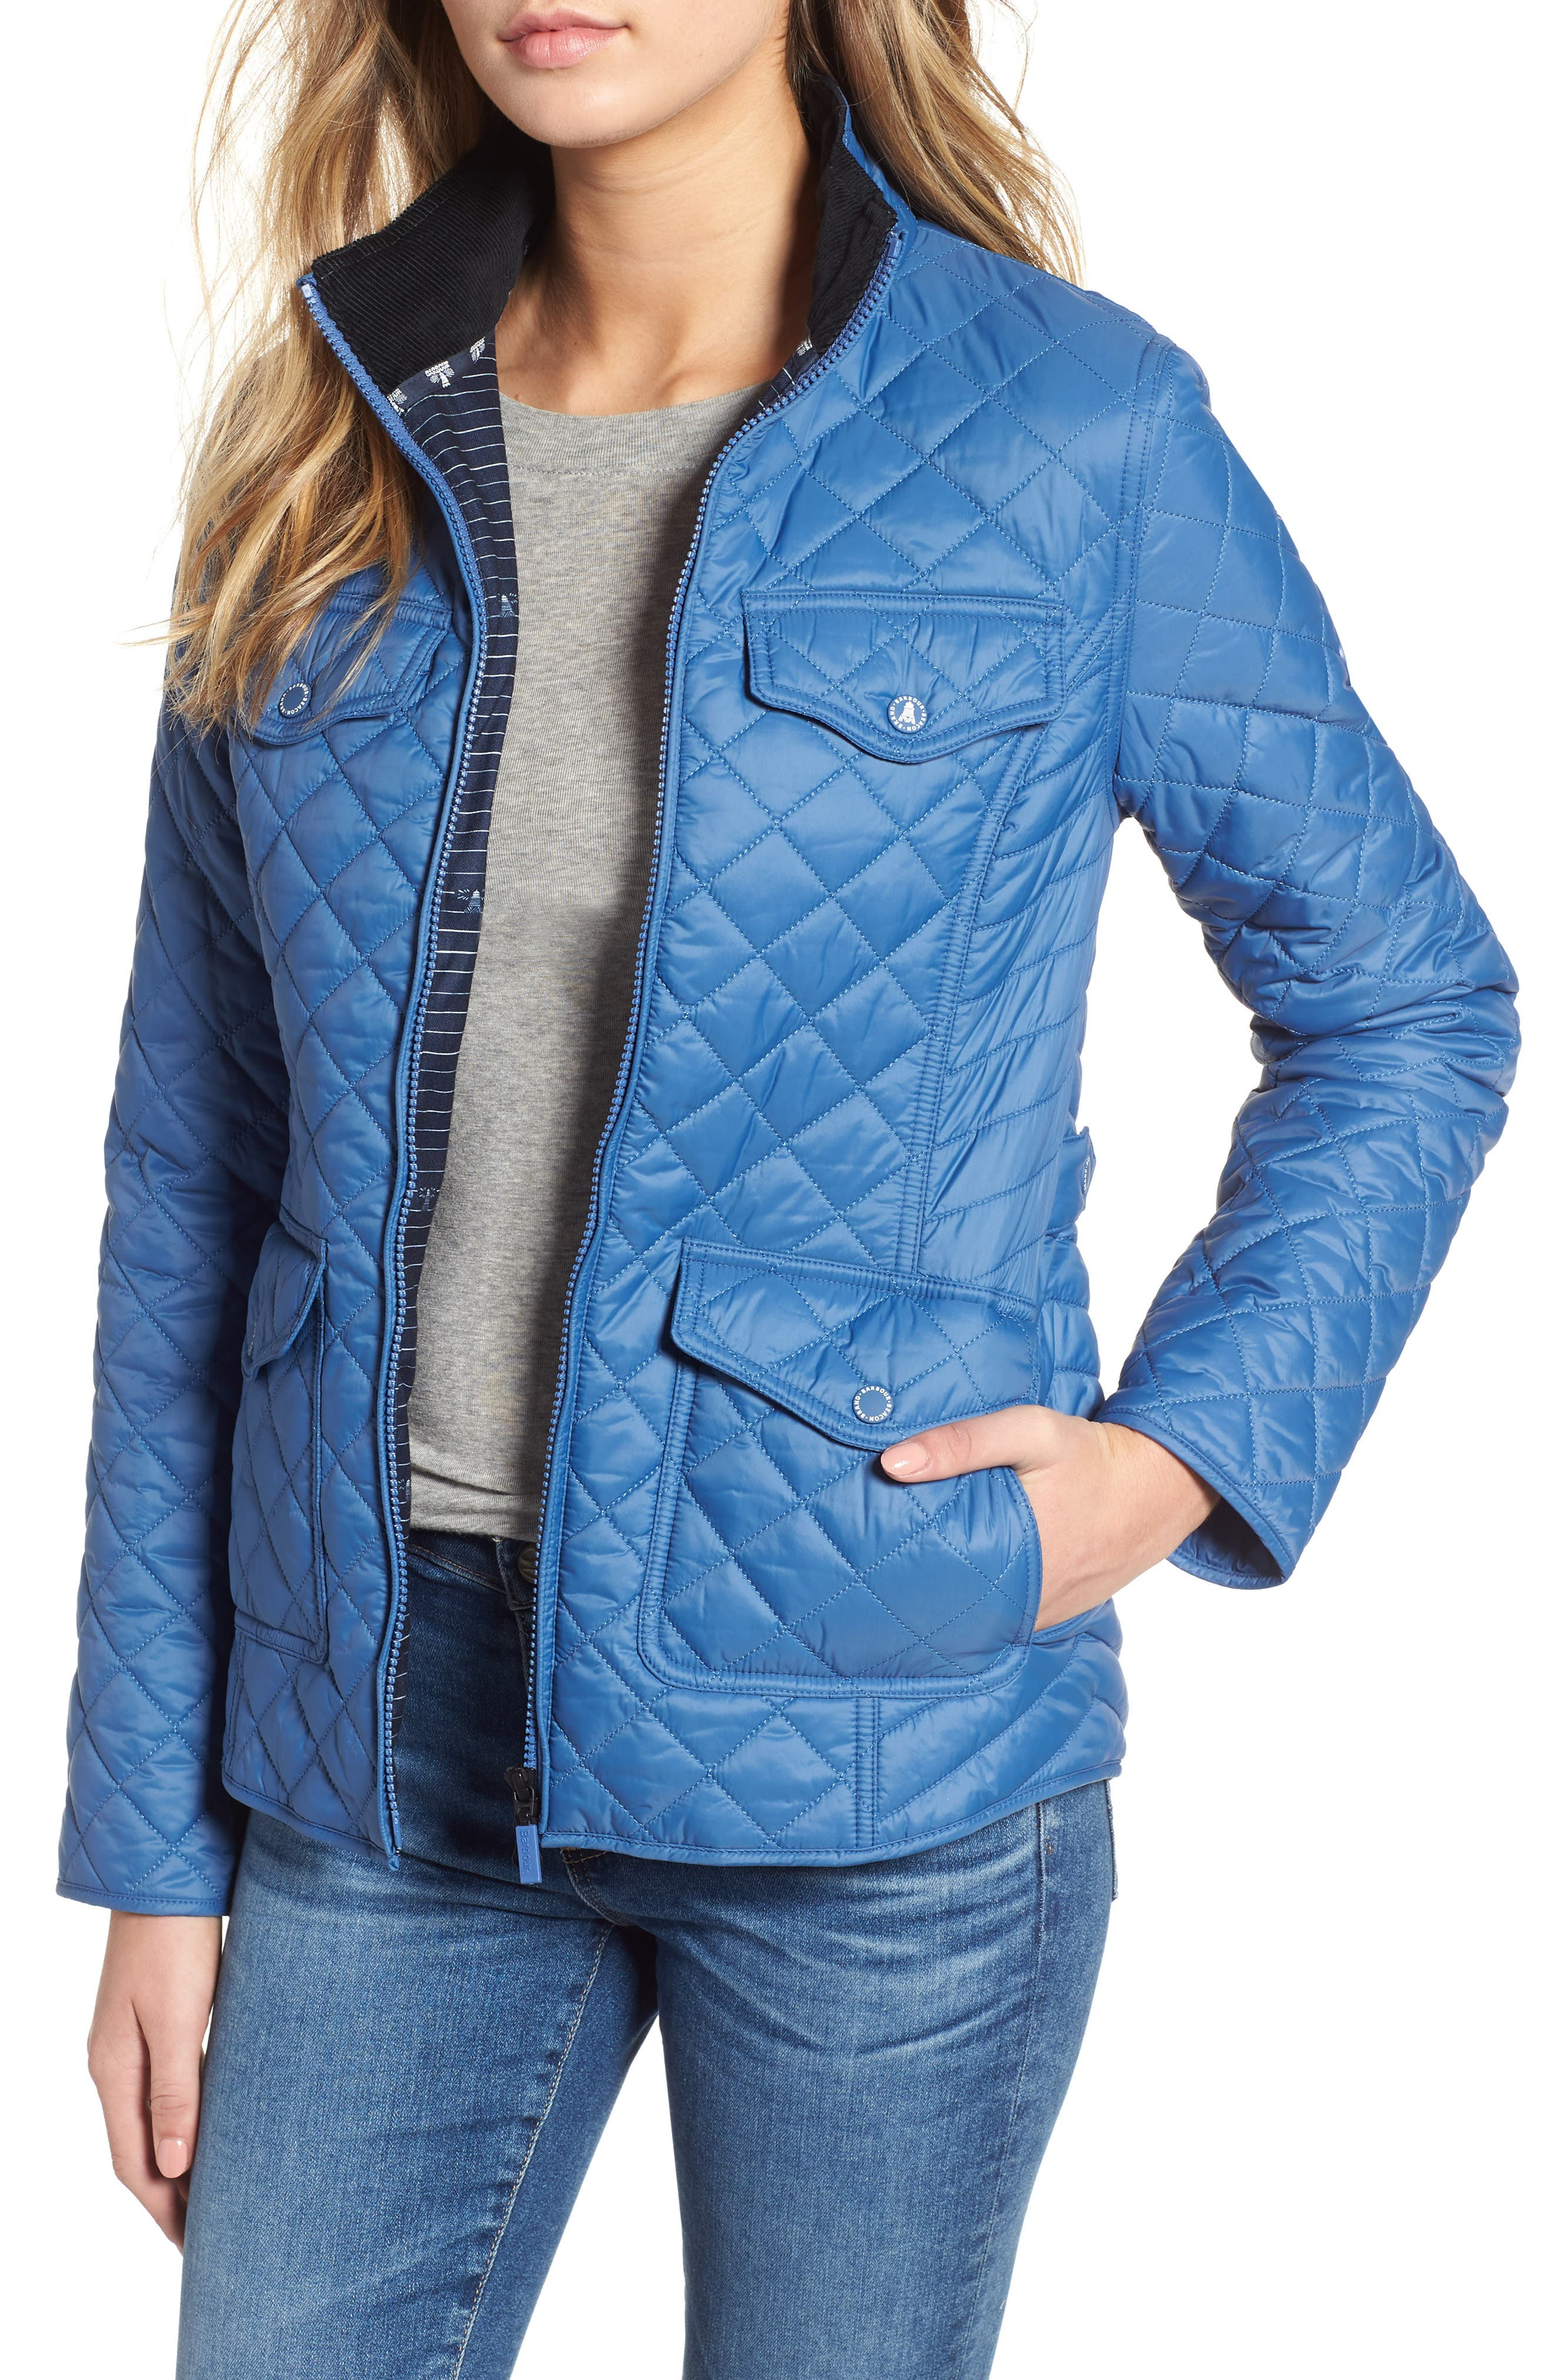 Barbour Sailboat Quilted Jacket, US / 10 UK - Blue